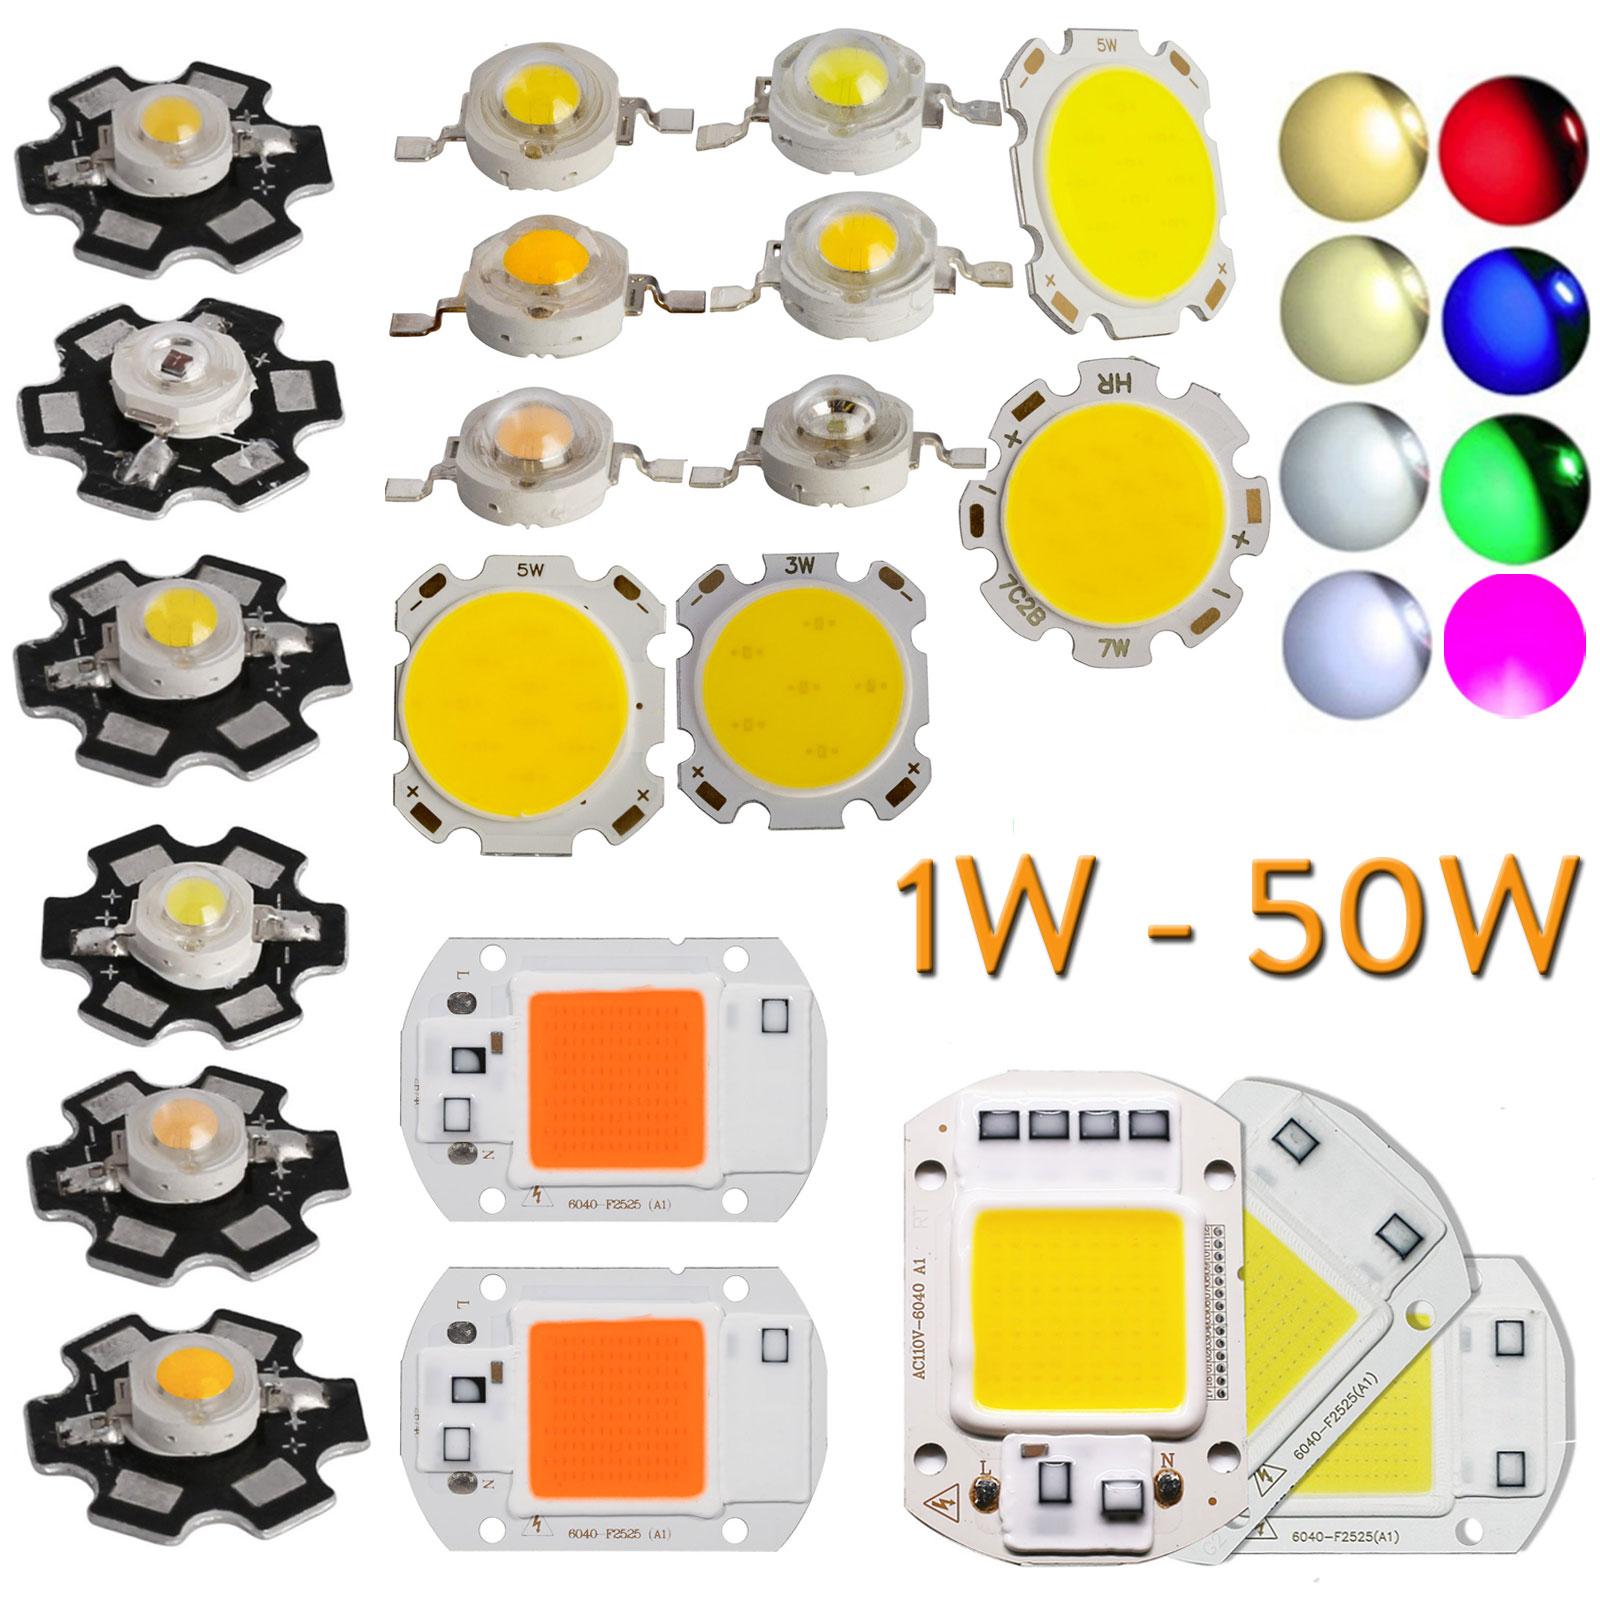 10x 50x 1W 3W 5W 7W SMD COB High Power Beads LED Chip With Star PCB White Light